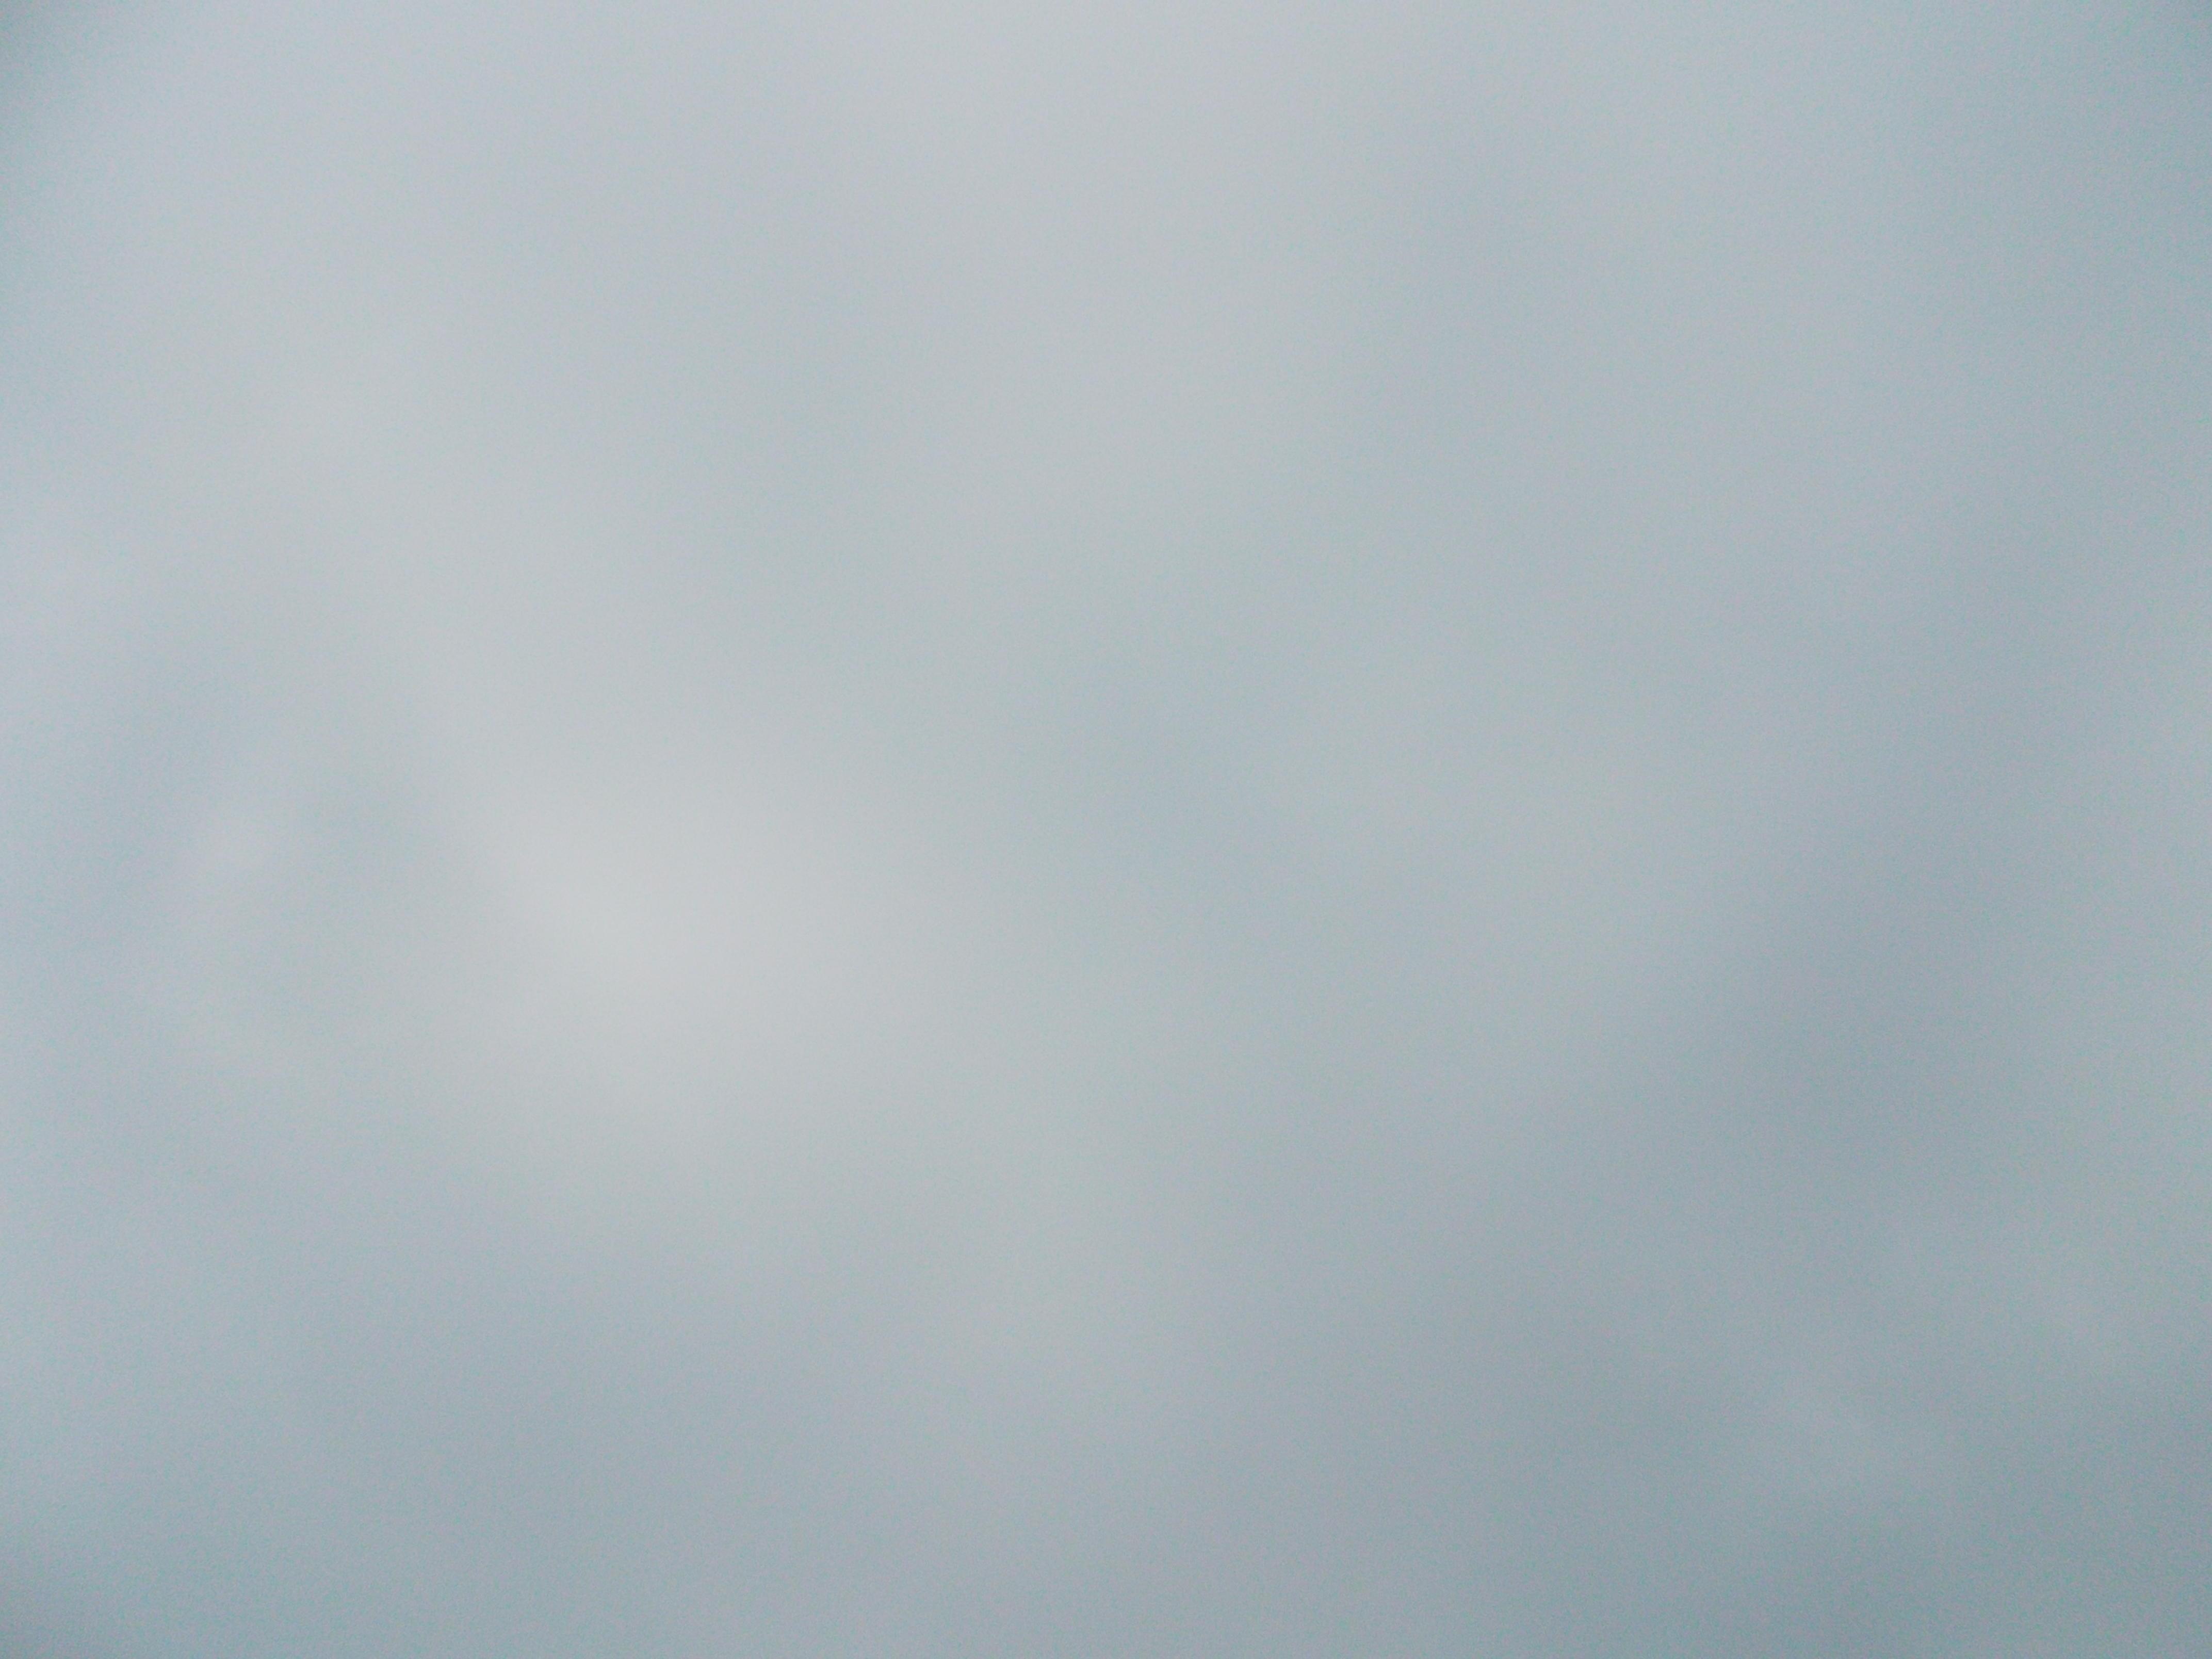 2013-03-02 Longitude -0.371 Latitude 49.182 Altitude 13 Heure 11h52